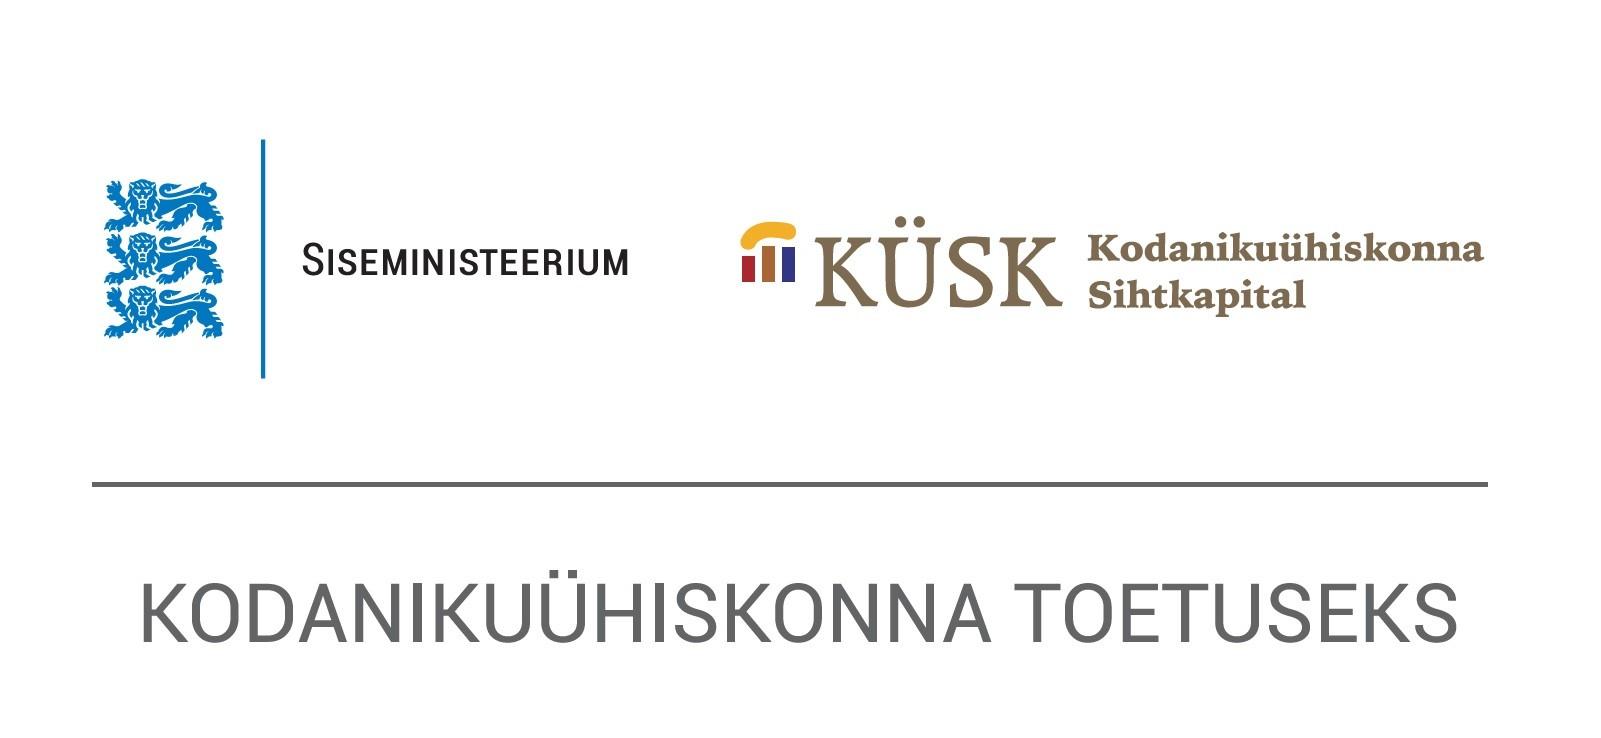 KYSk logo